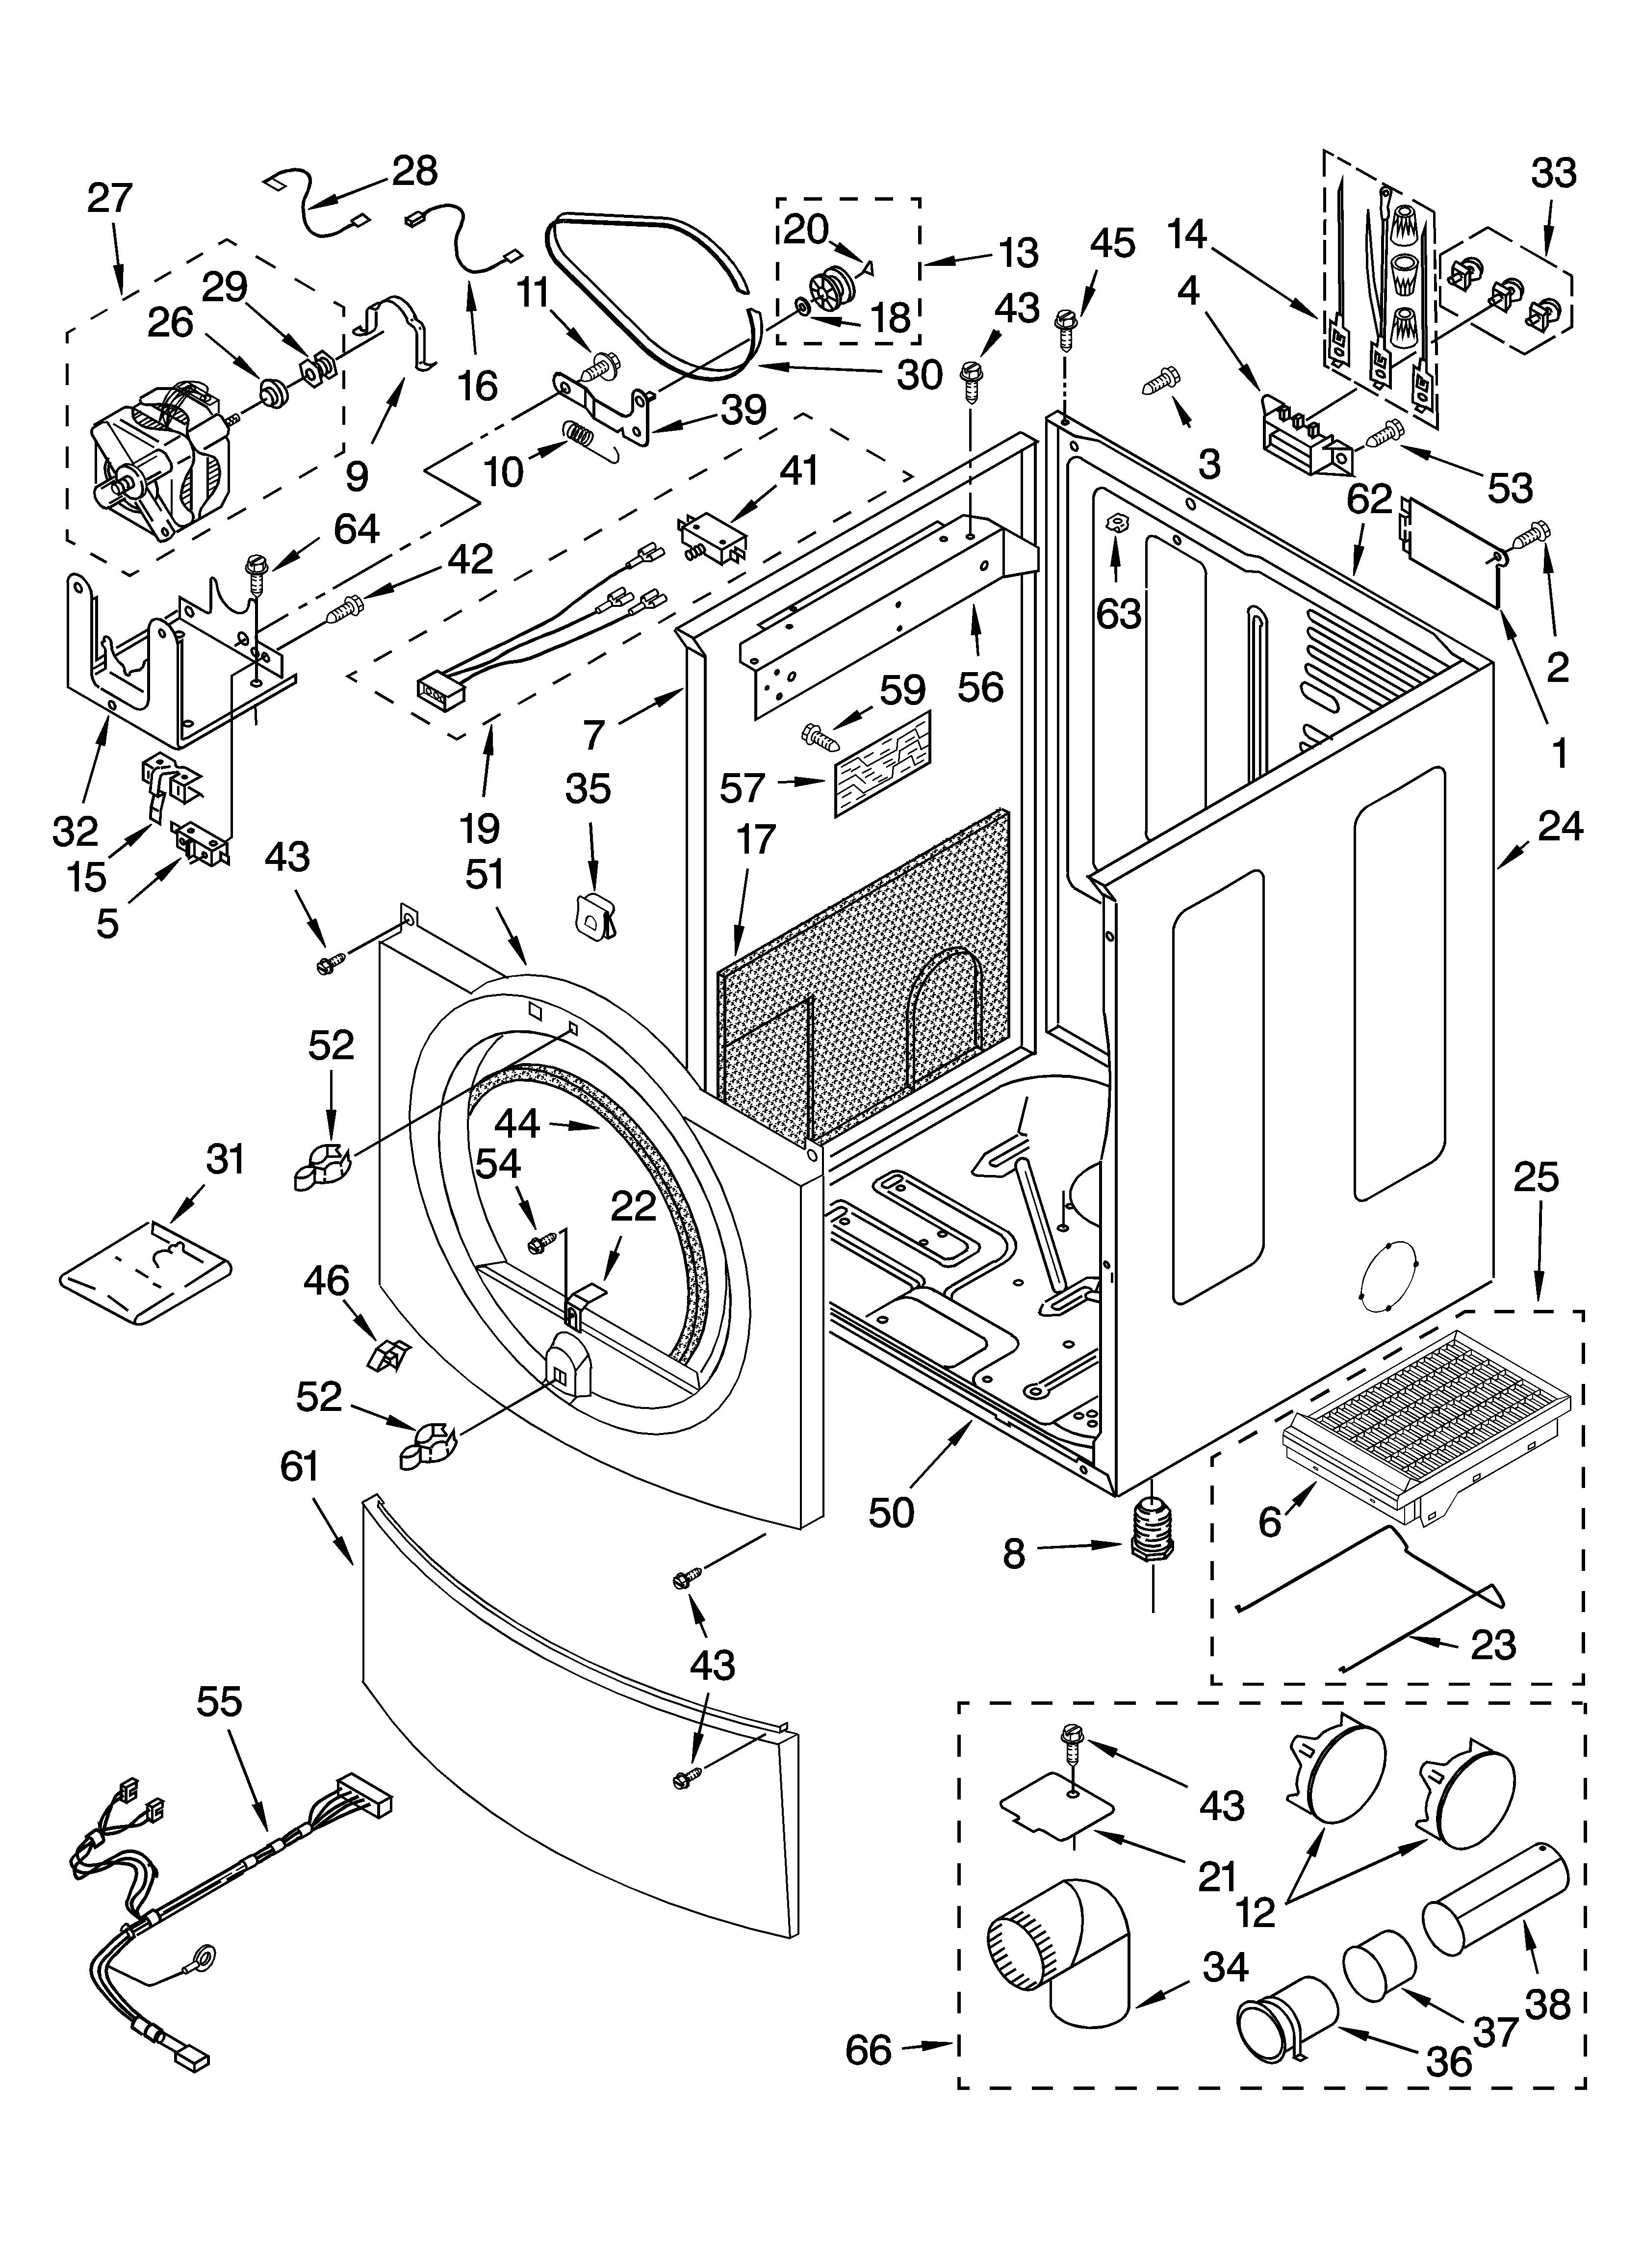 Wiring Diagram For Samsung Dryer Heating Element Wiring Diagrams – Wiring Diagram For Whirlpool Dryer